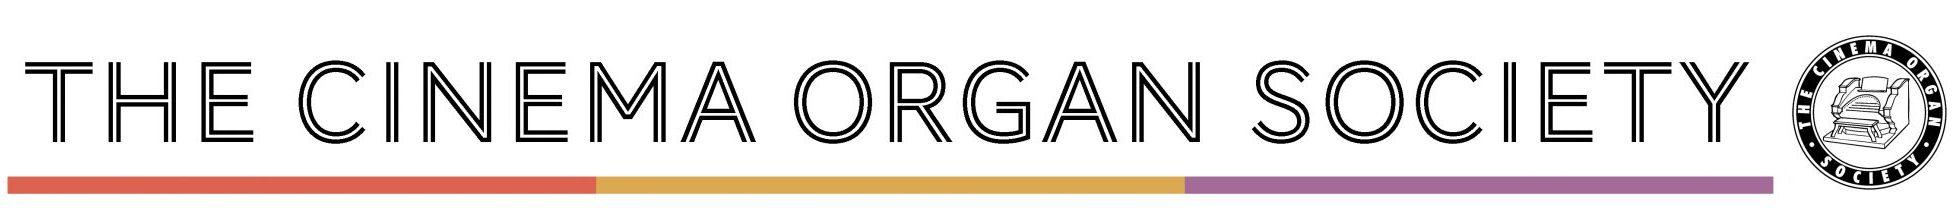 The Cinema Organ Society